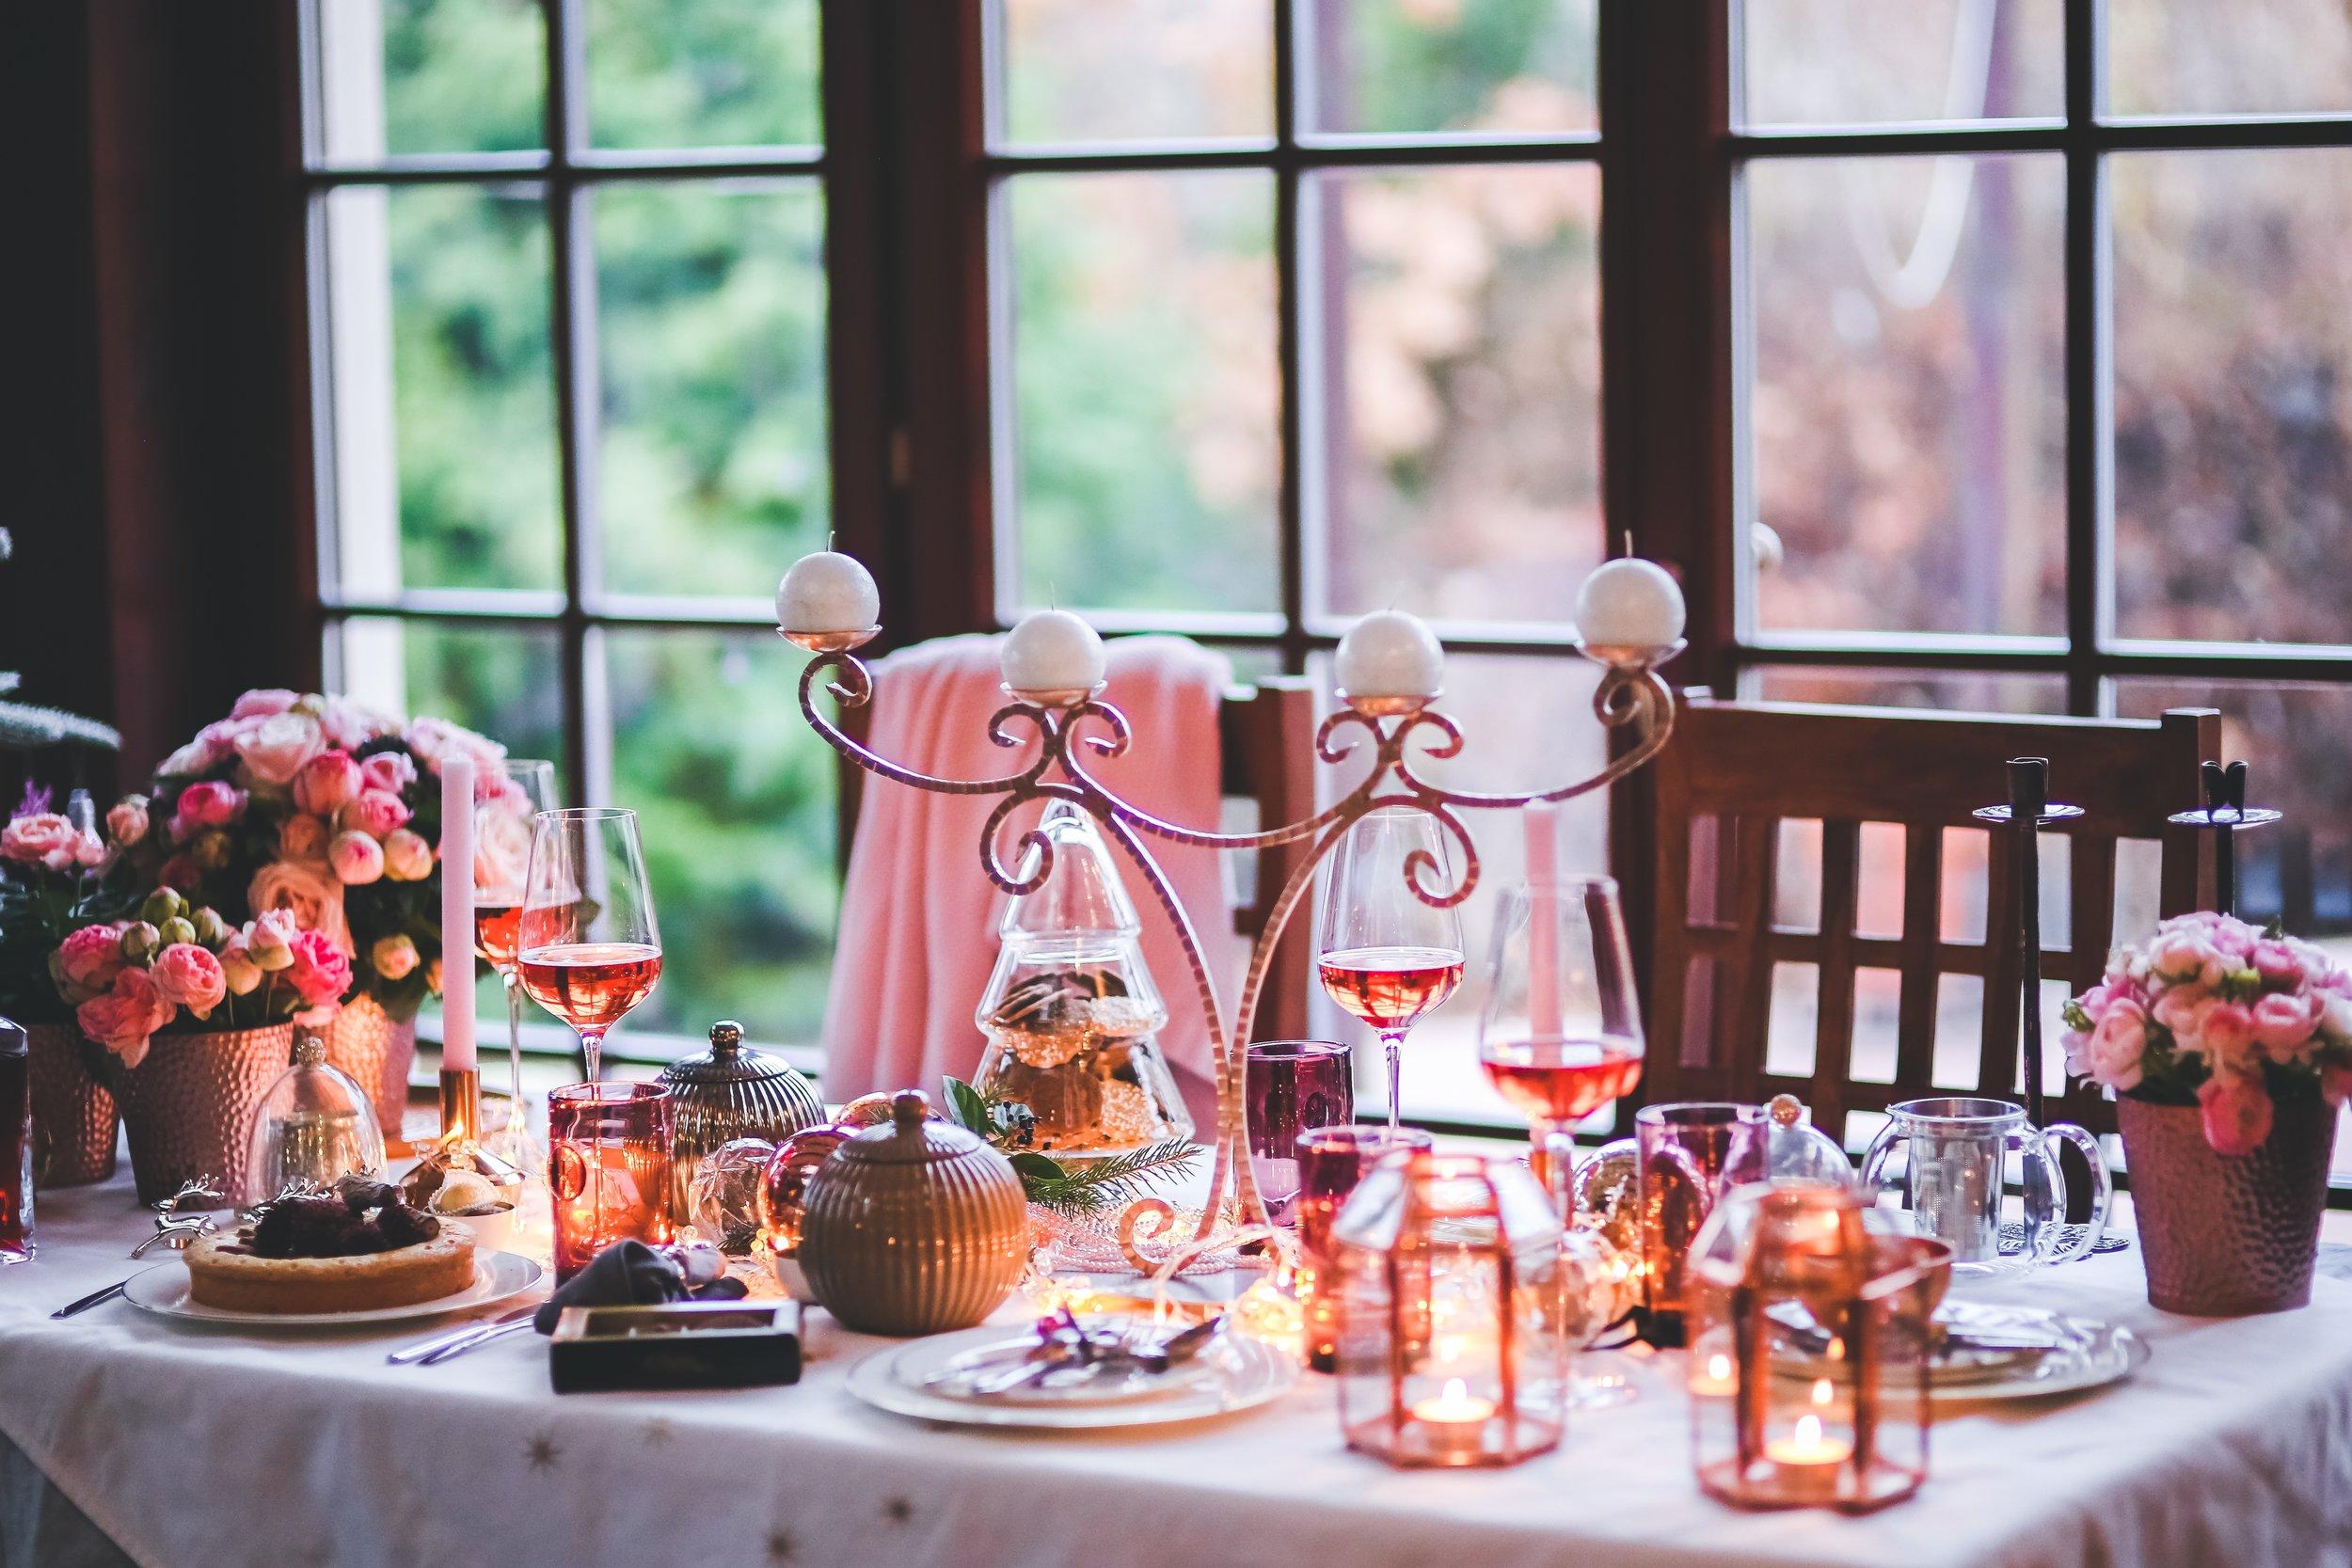 table-restaurant-love-evening-decoration-meal-722502-pxhere.com.jpg